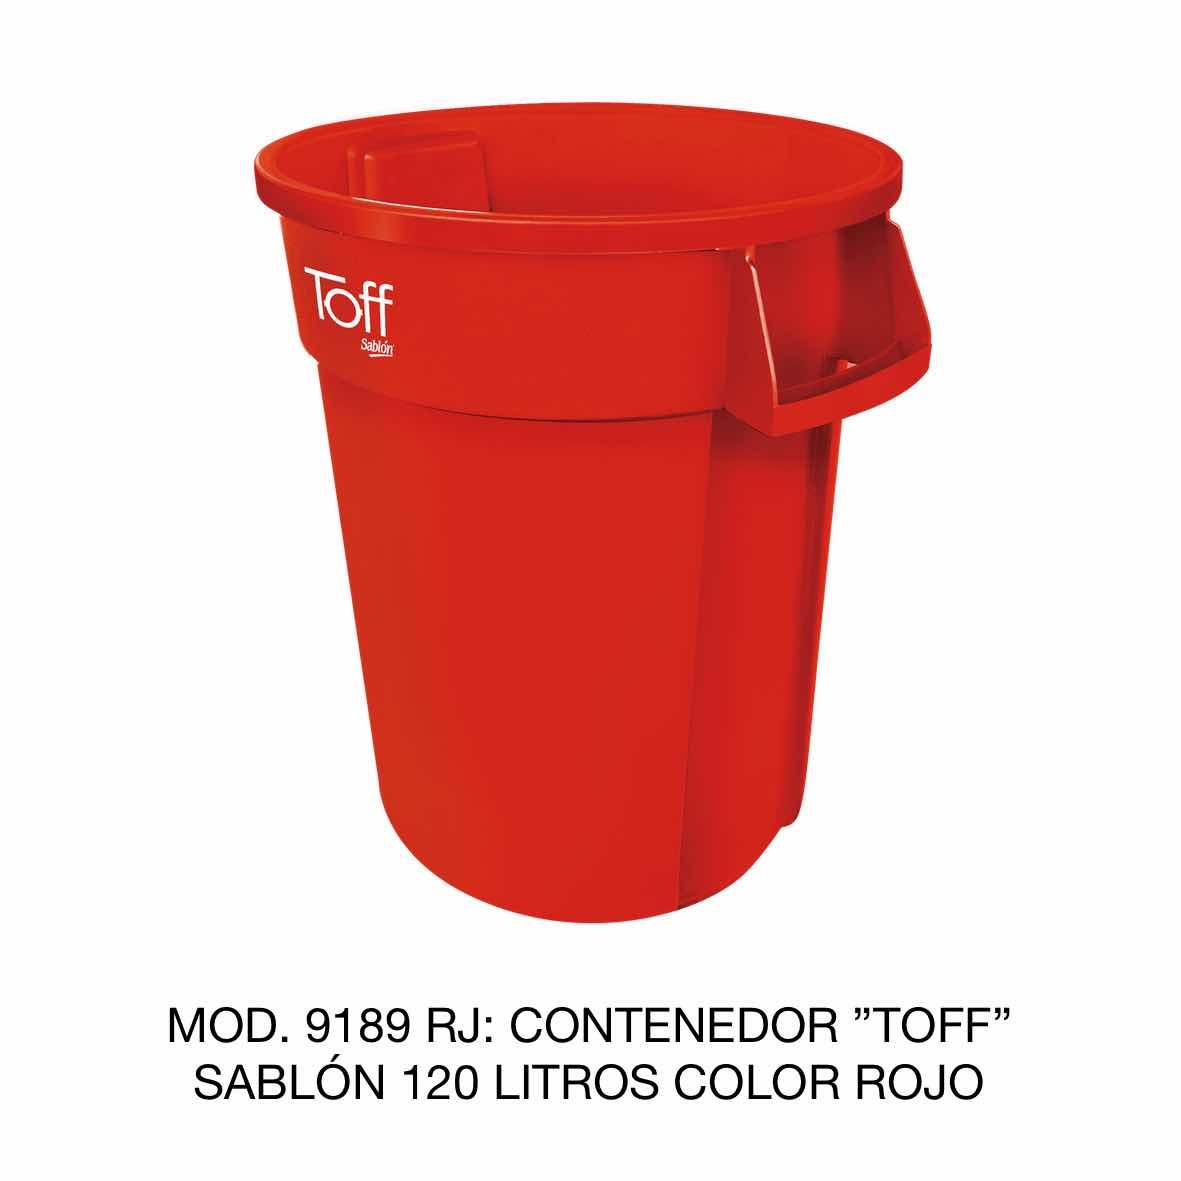 Contenedor de basura Sablón modelo TOFF de 120 litros Modelo 9189 RJ Color Rojo